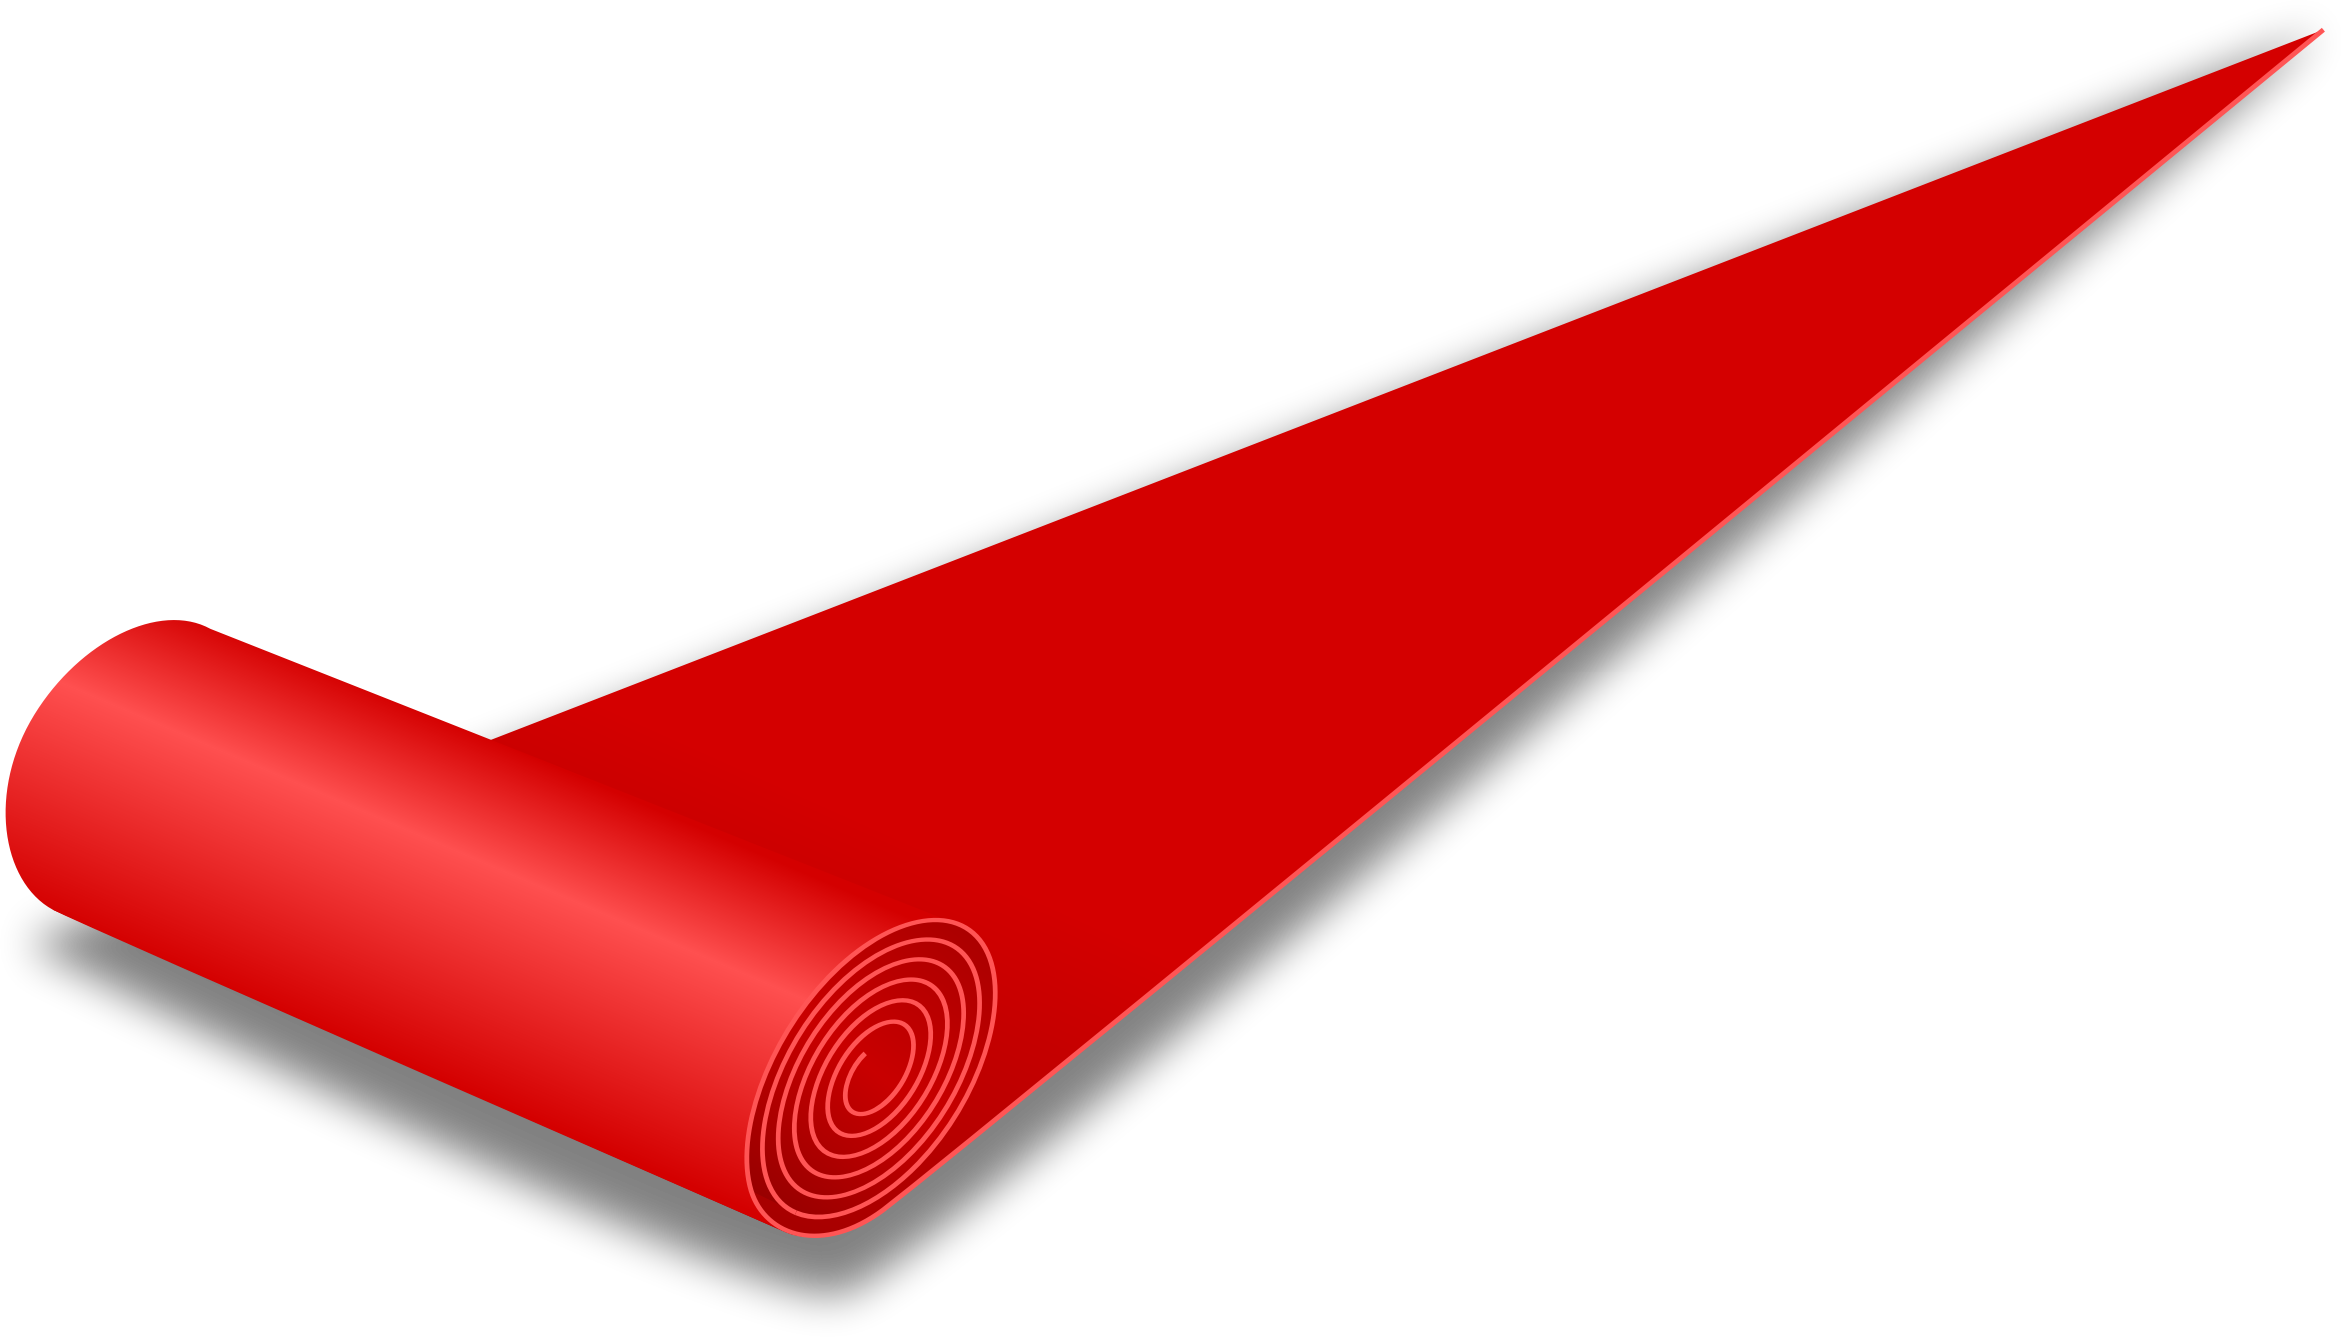 2341x1337 Red Carpet Clip Art